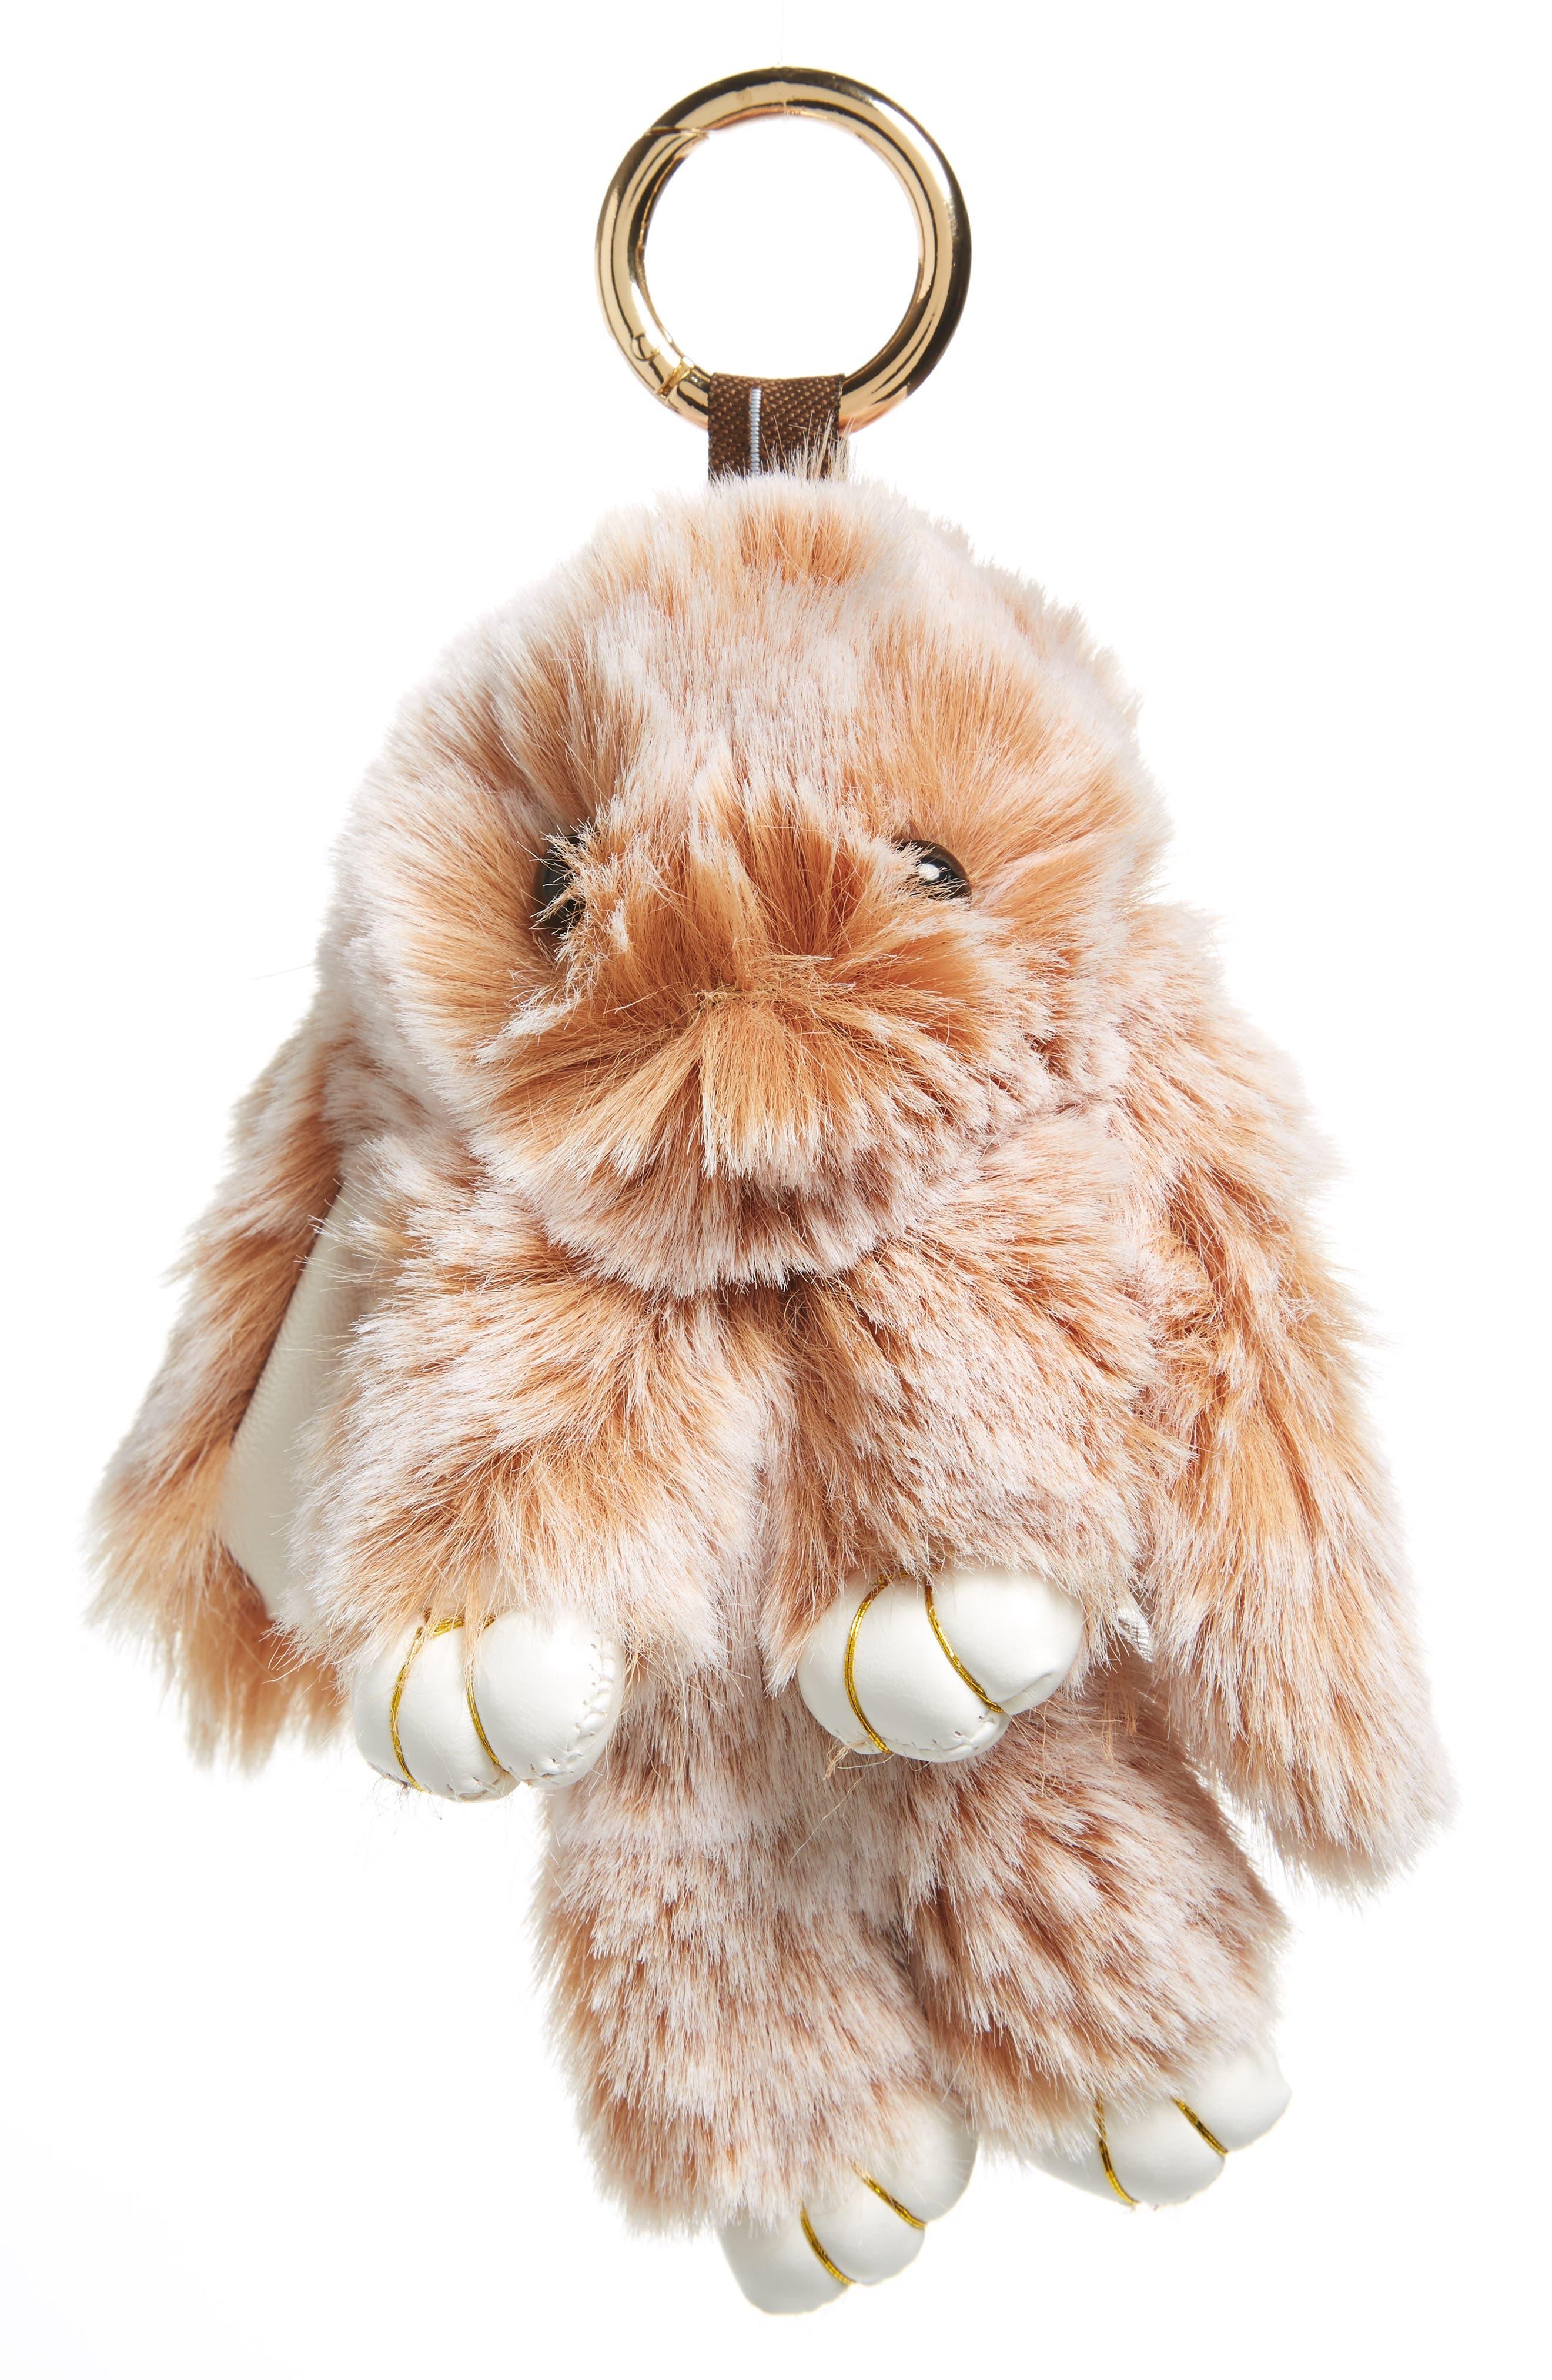 CARA Faux Fur Bunny Rabbit Key Chain